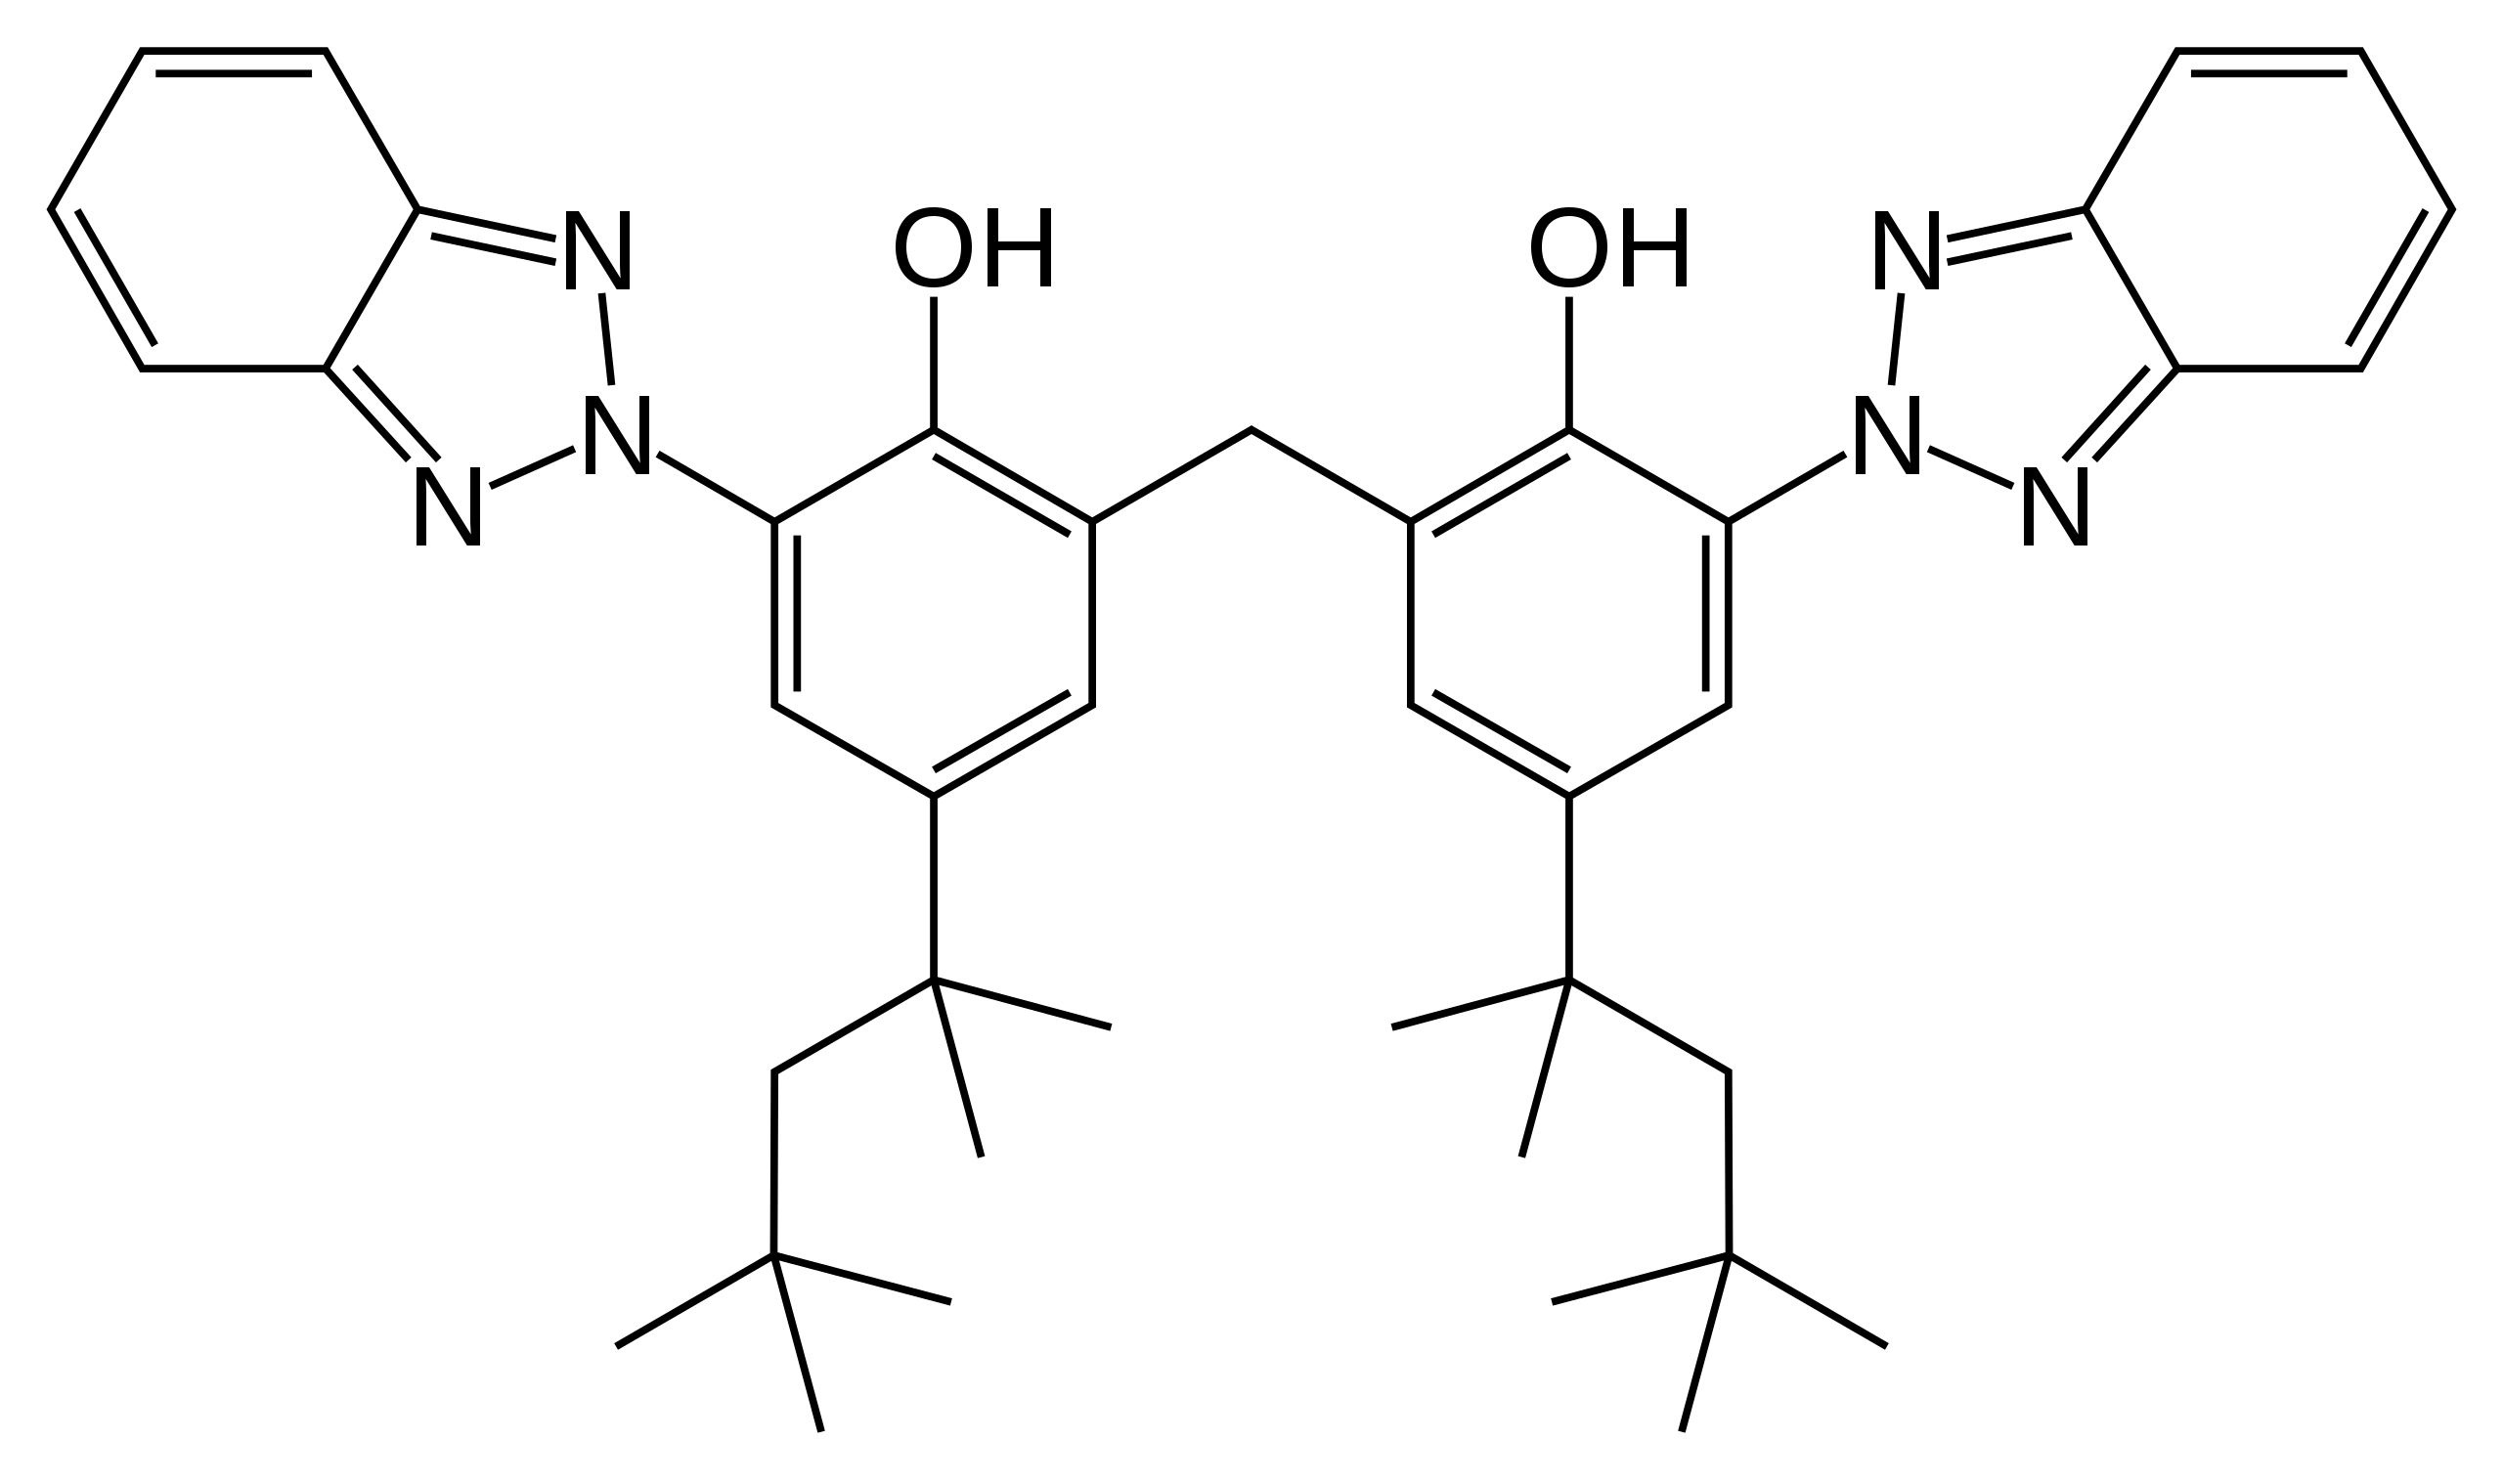 Methylene Bis-Benzotriazolyl Tetramethylbutylphenol - Tinosorb M